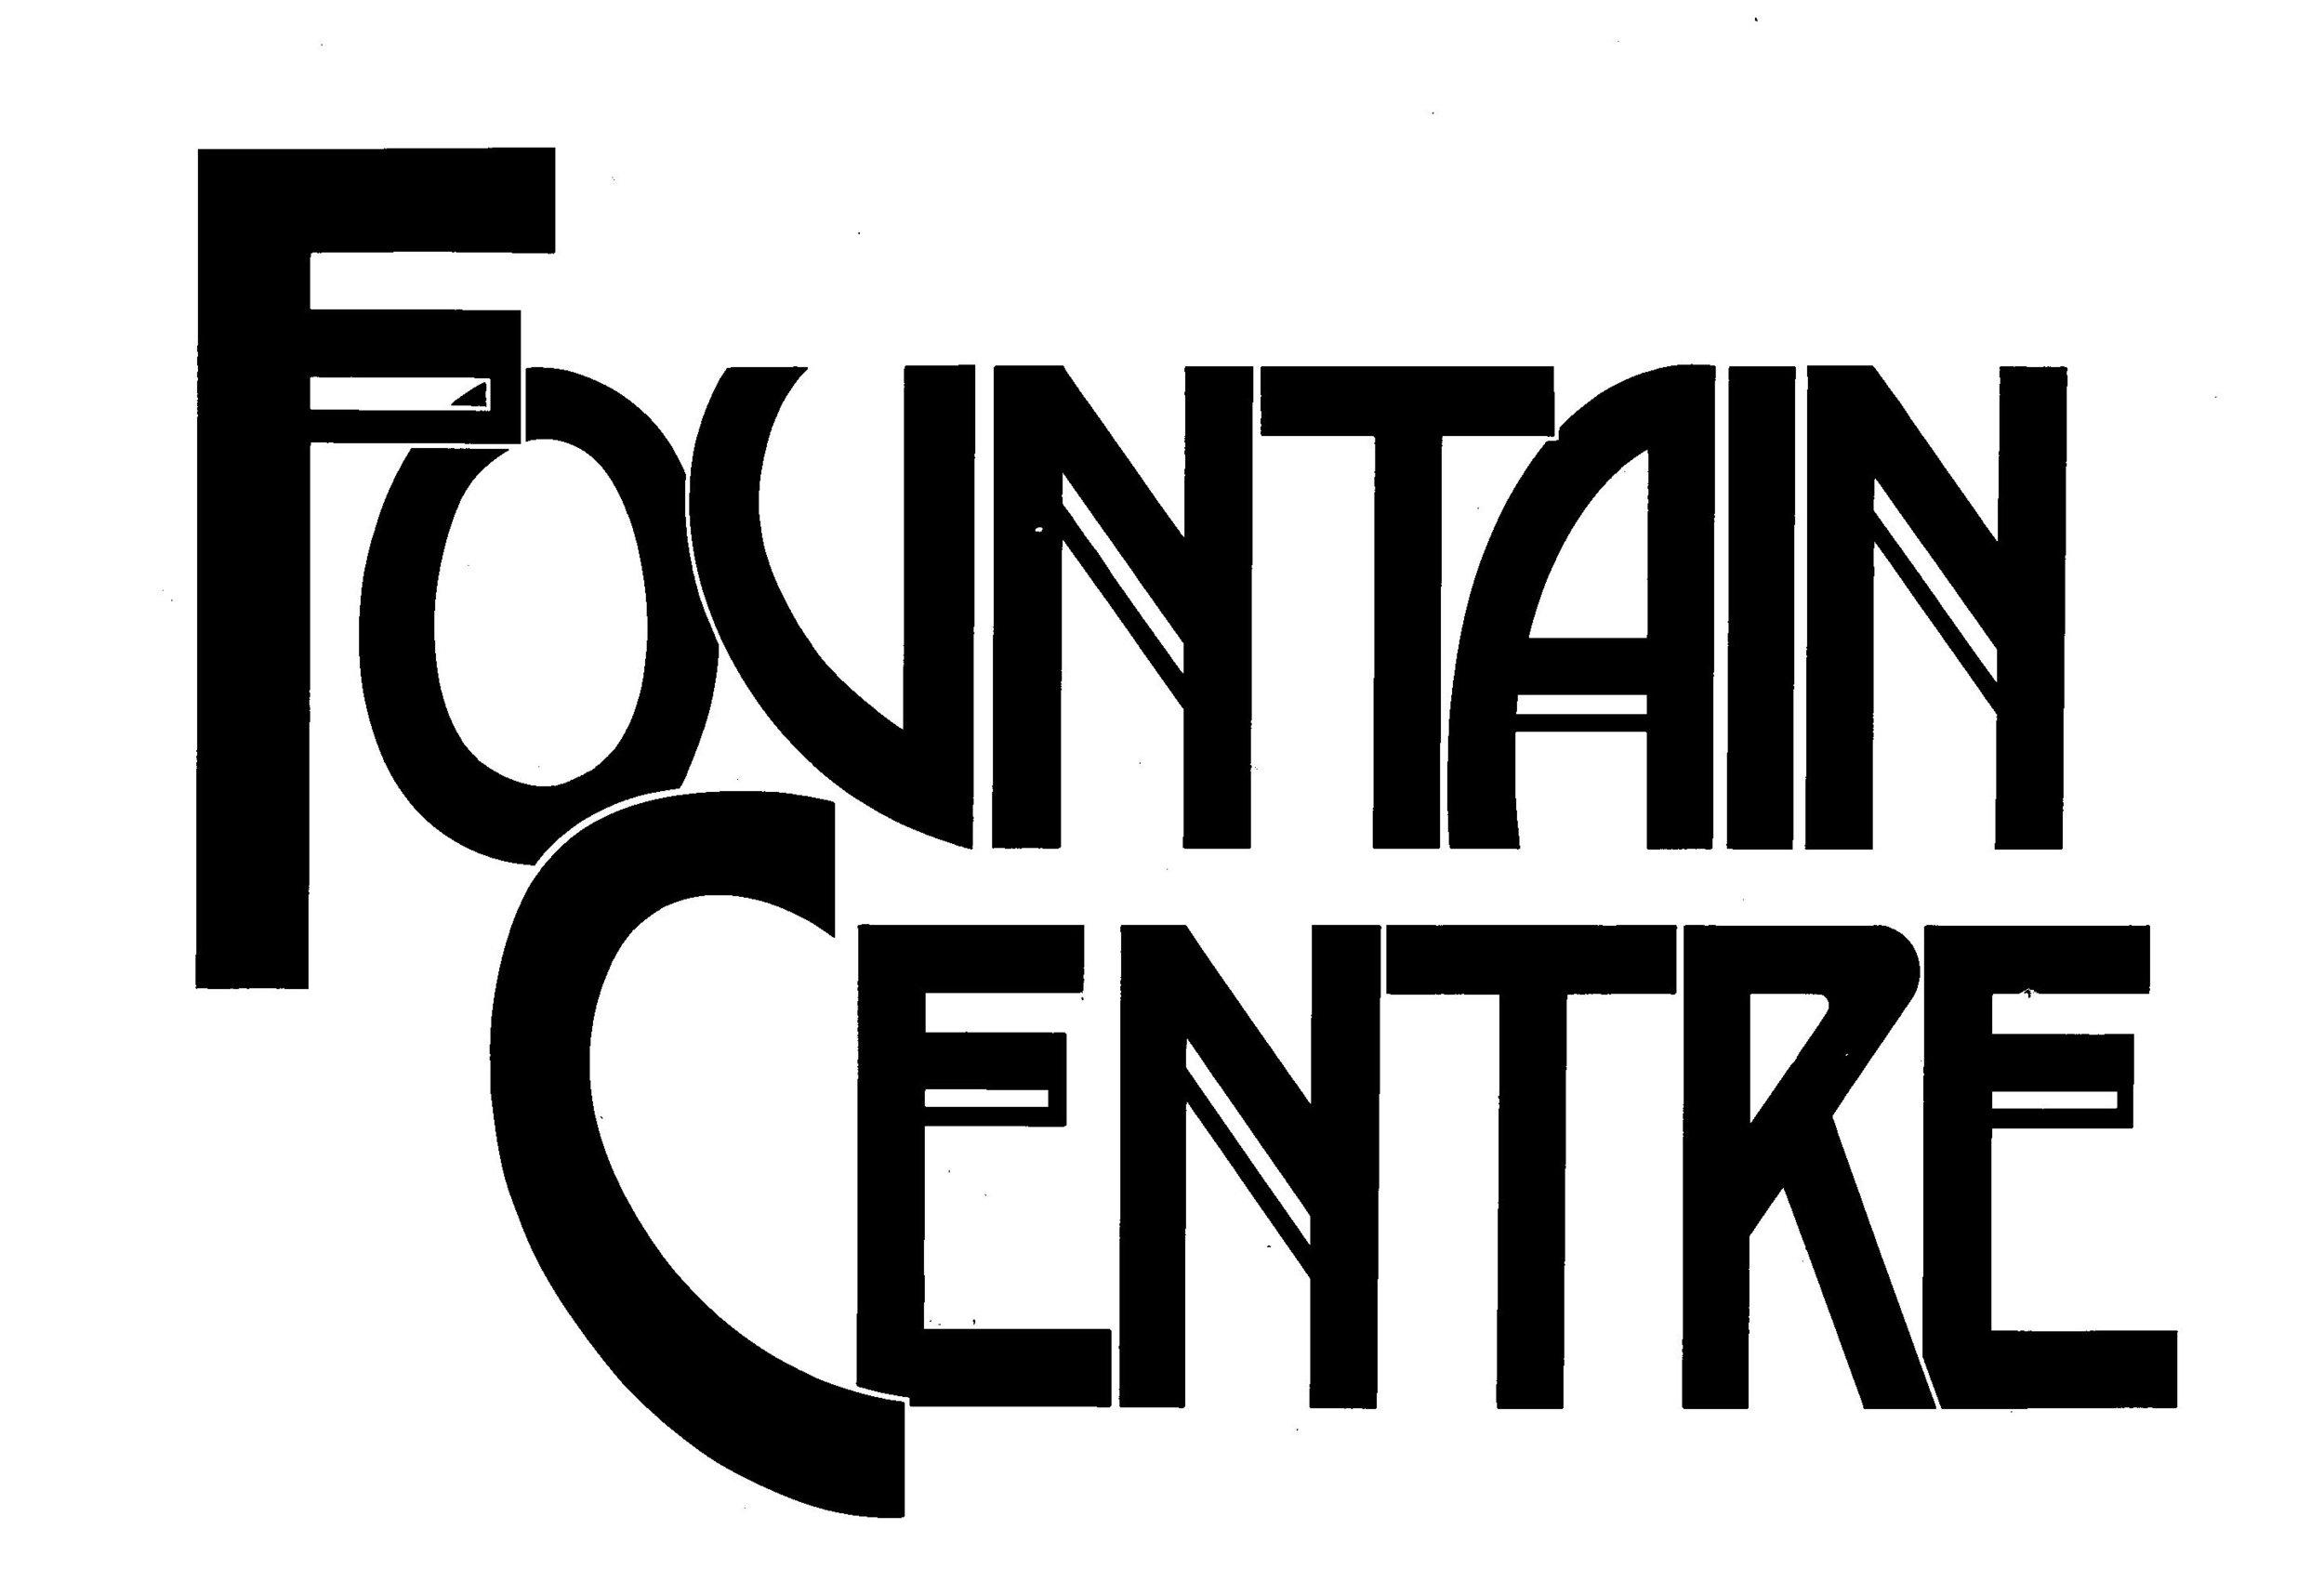 Fountain centre Text.jpg